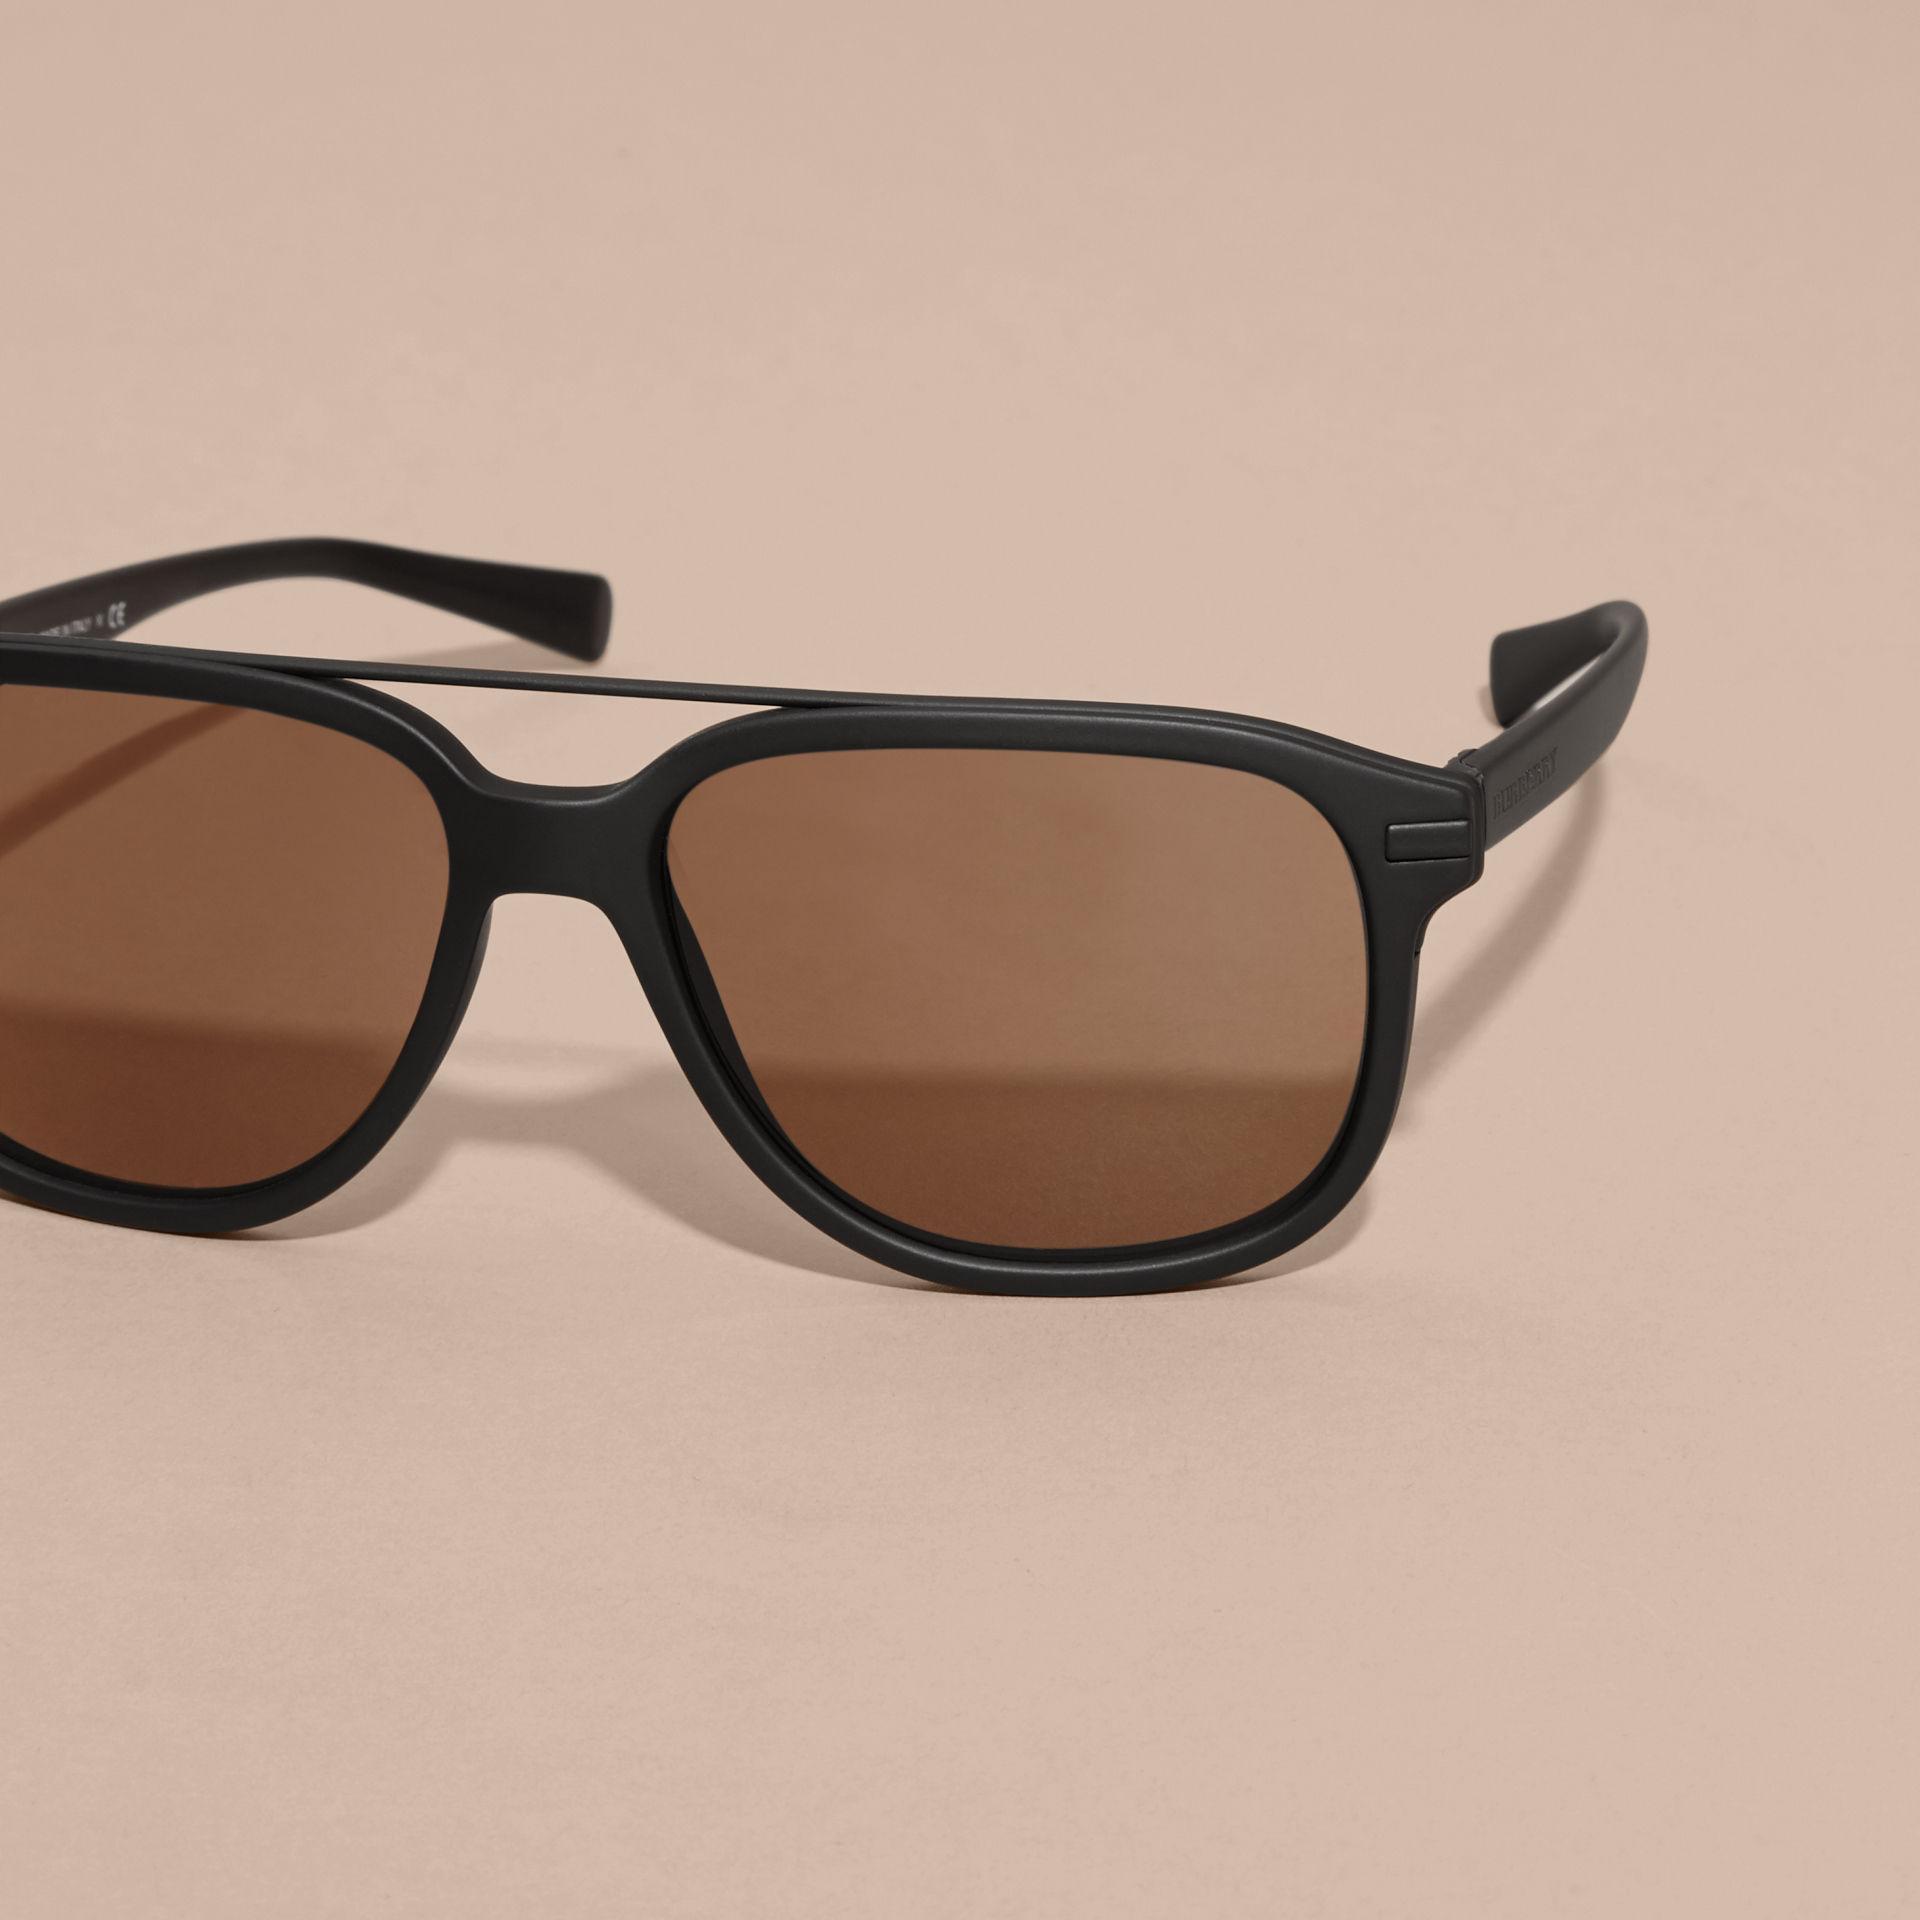 Burberry Glasses Frame Parts : Burberry Square Frame Sunglasses Black in Black for Men Lyst